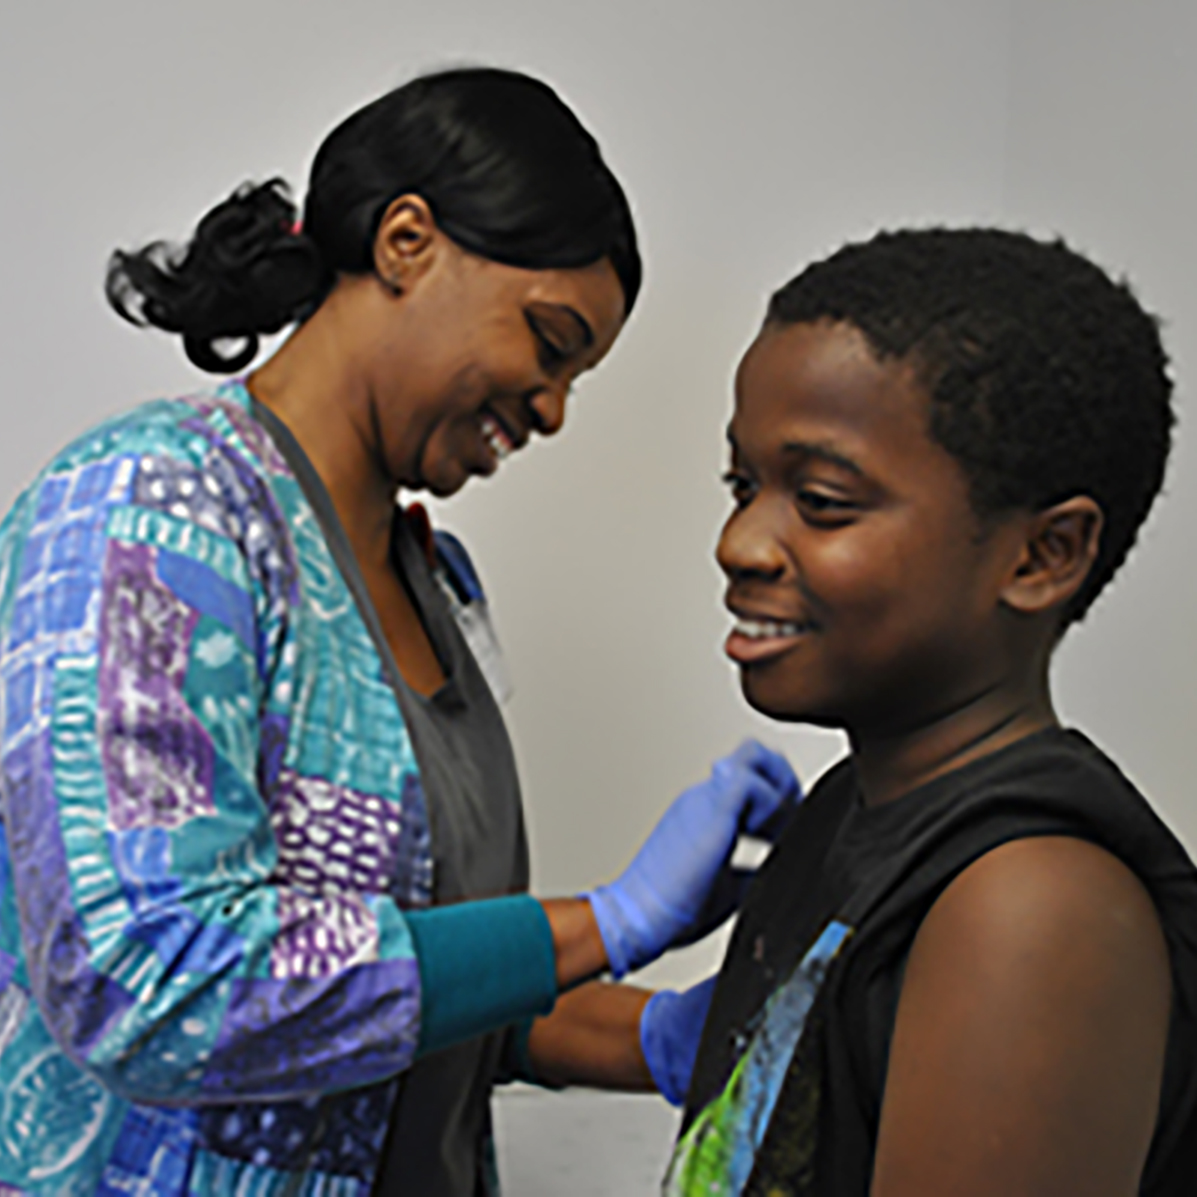 Northwest Assistance Ministries Providing Free Immunizations for Children